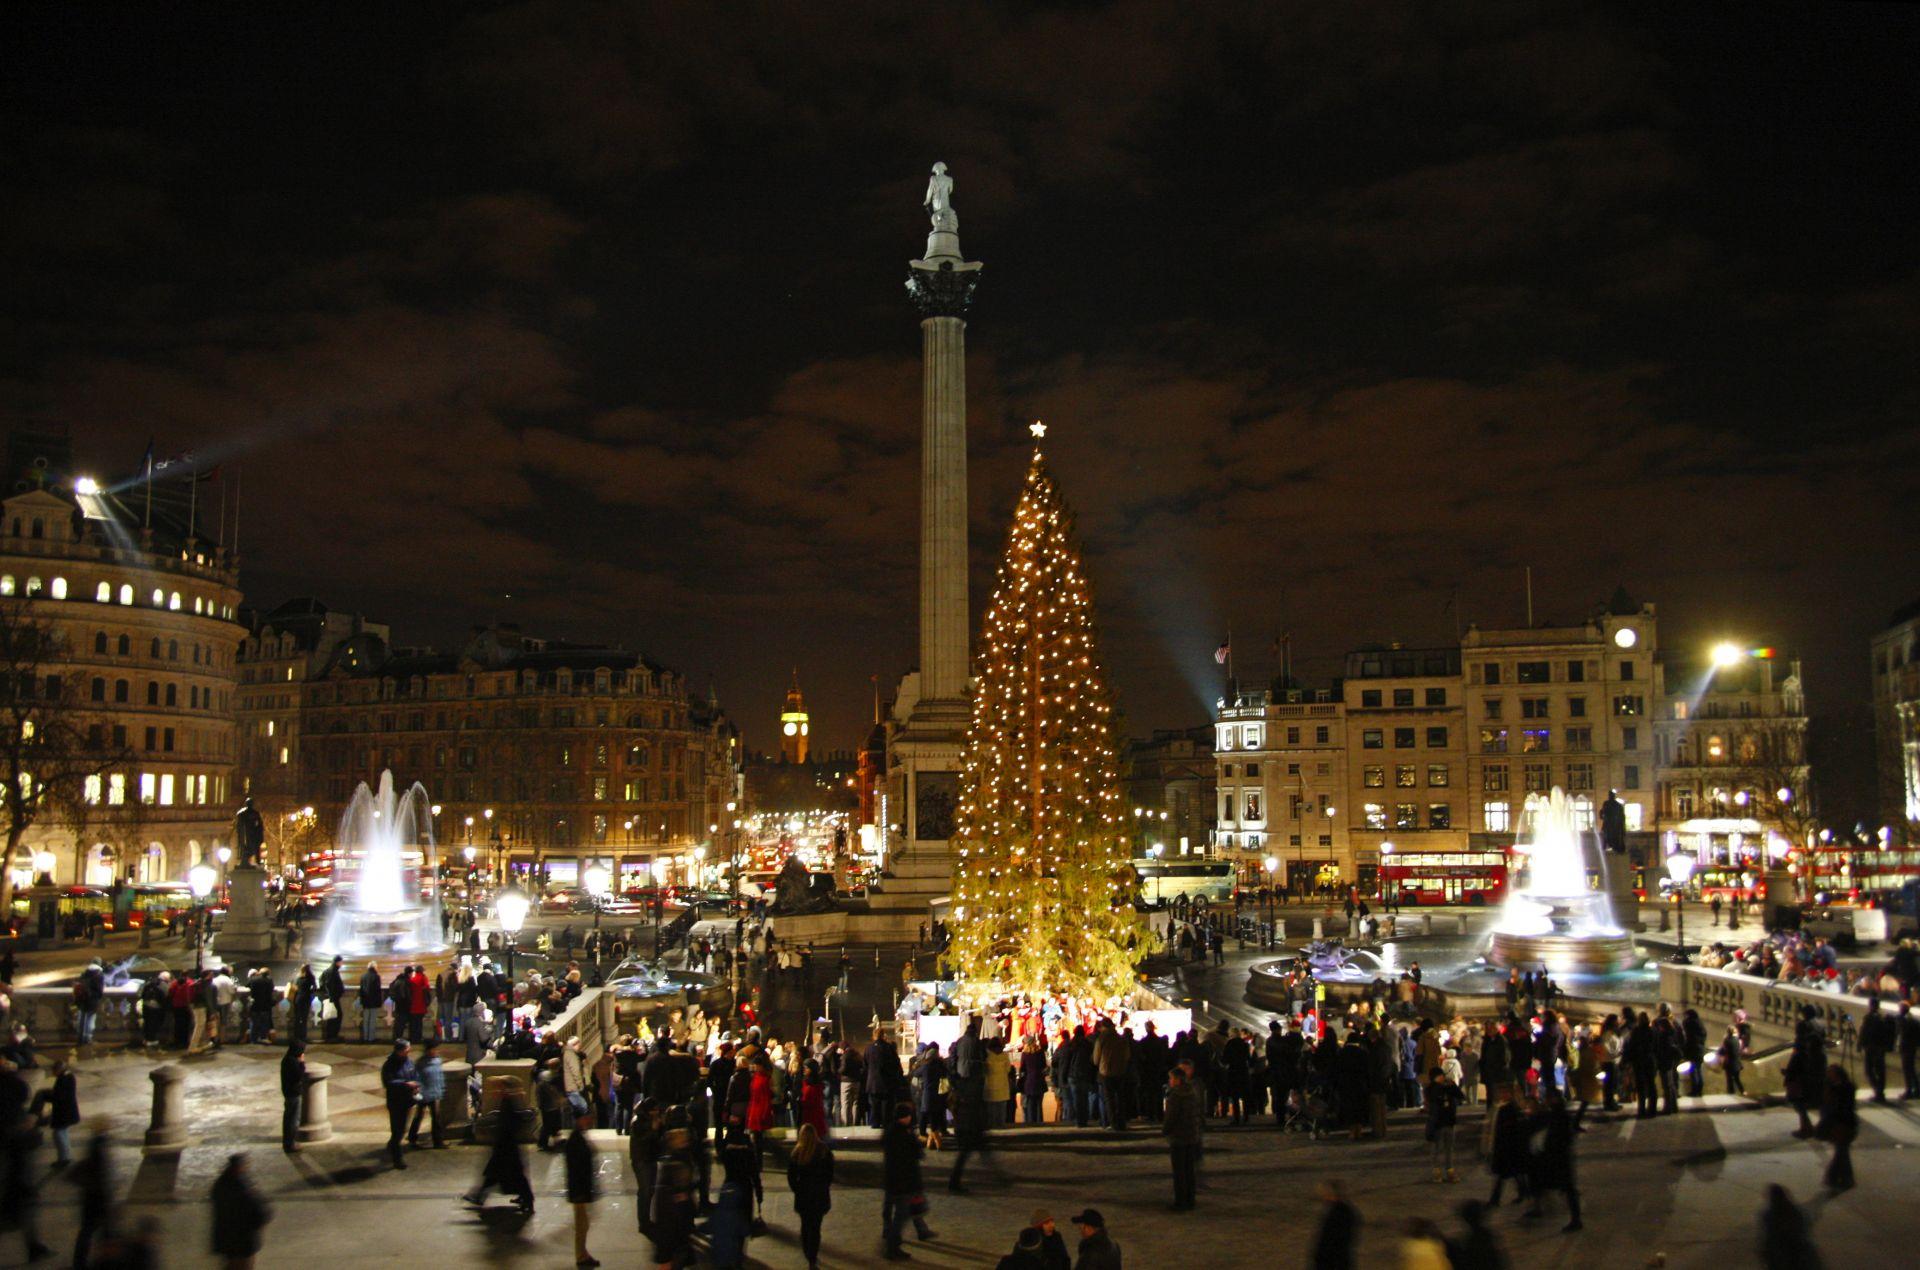 trafalgar square christmas tree - photo #10